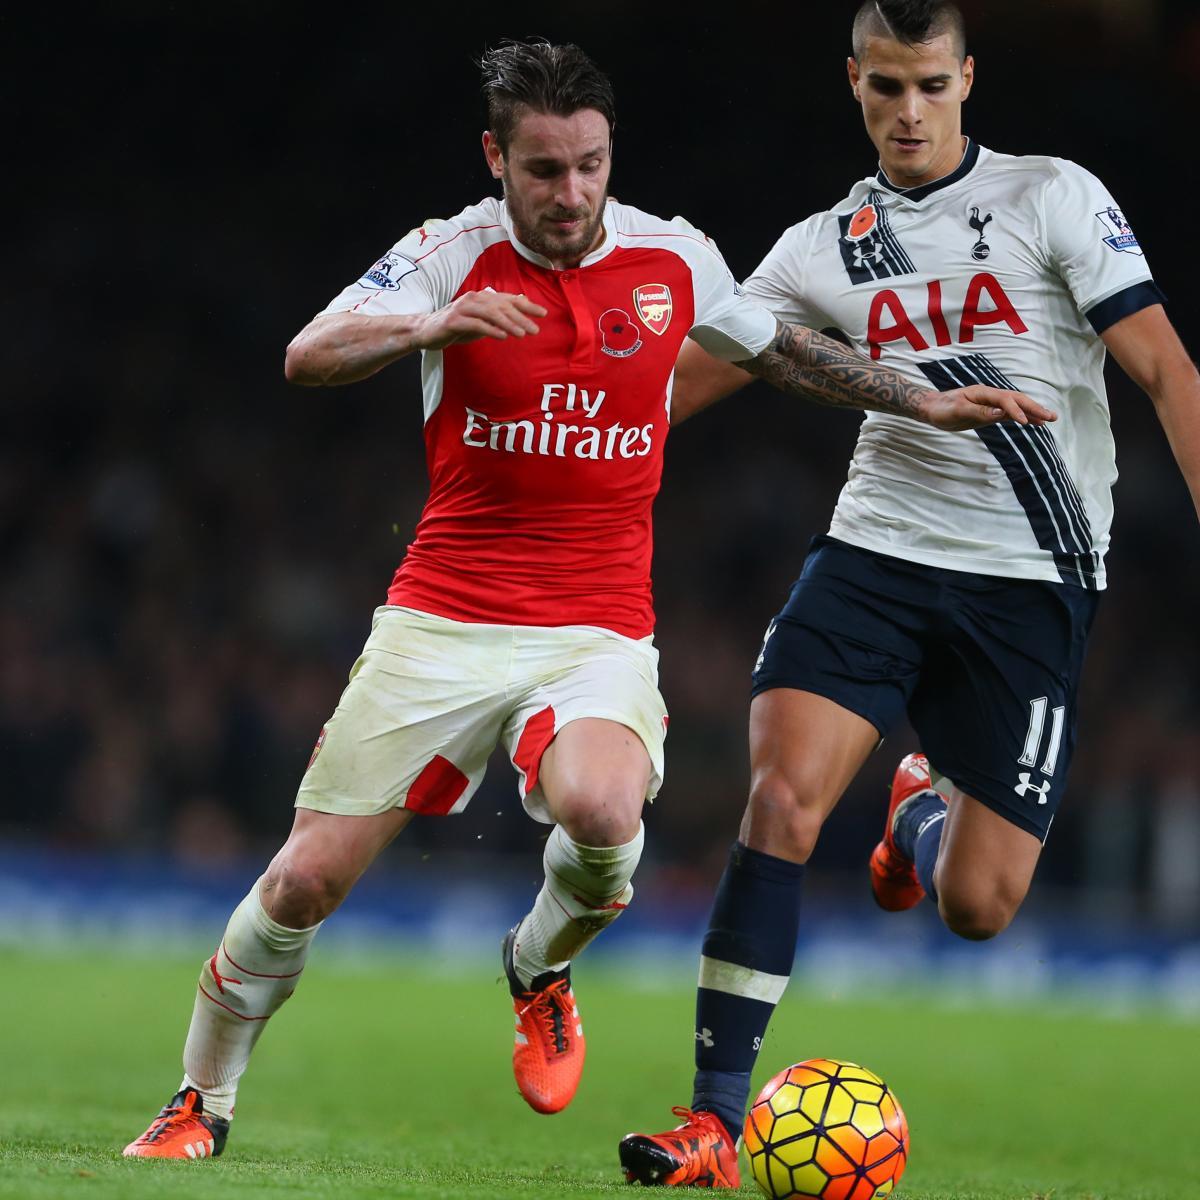 Arsenal Vs Tottenham Live Score Highlights From Premier: Tottenham Vs. Arsenal: Live Score, Highlights From North